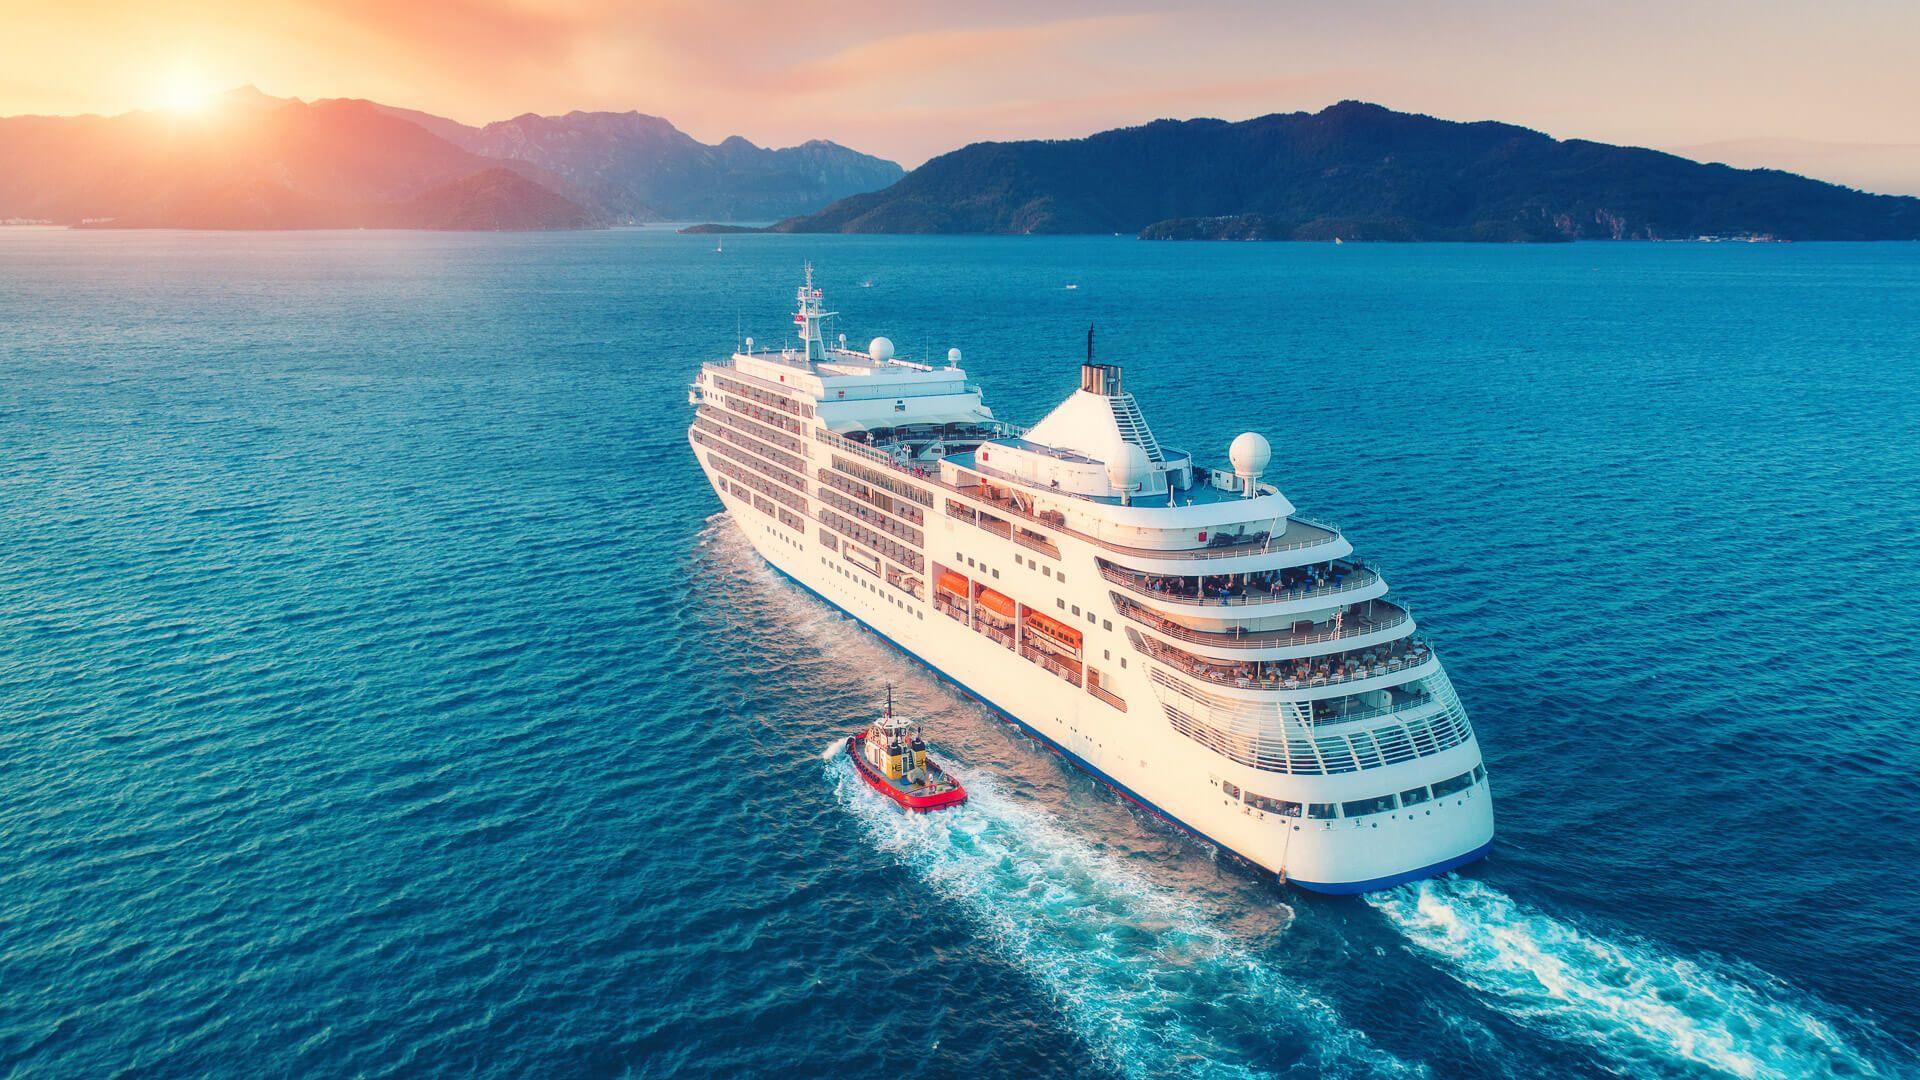 cruiseline approaching land port